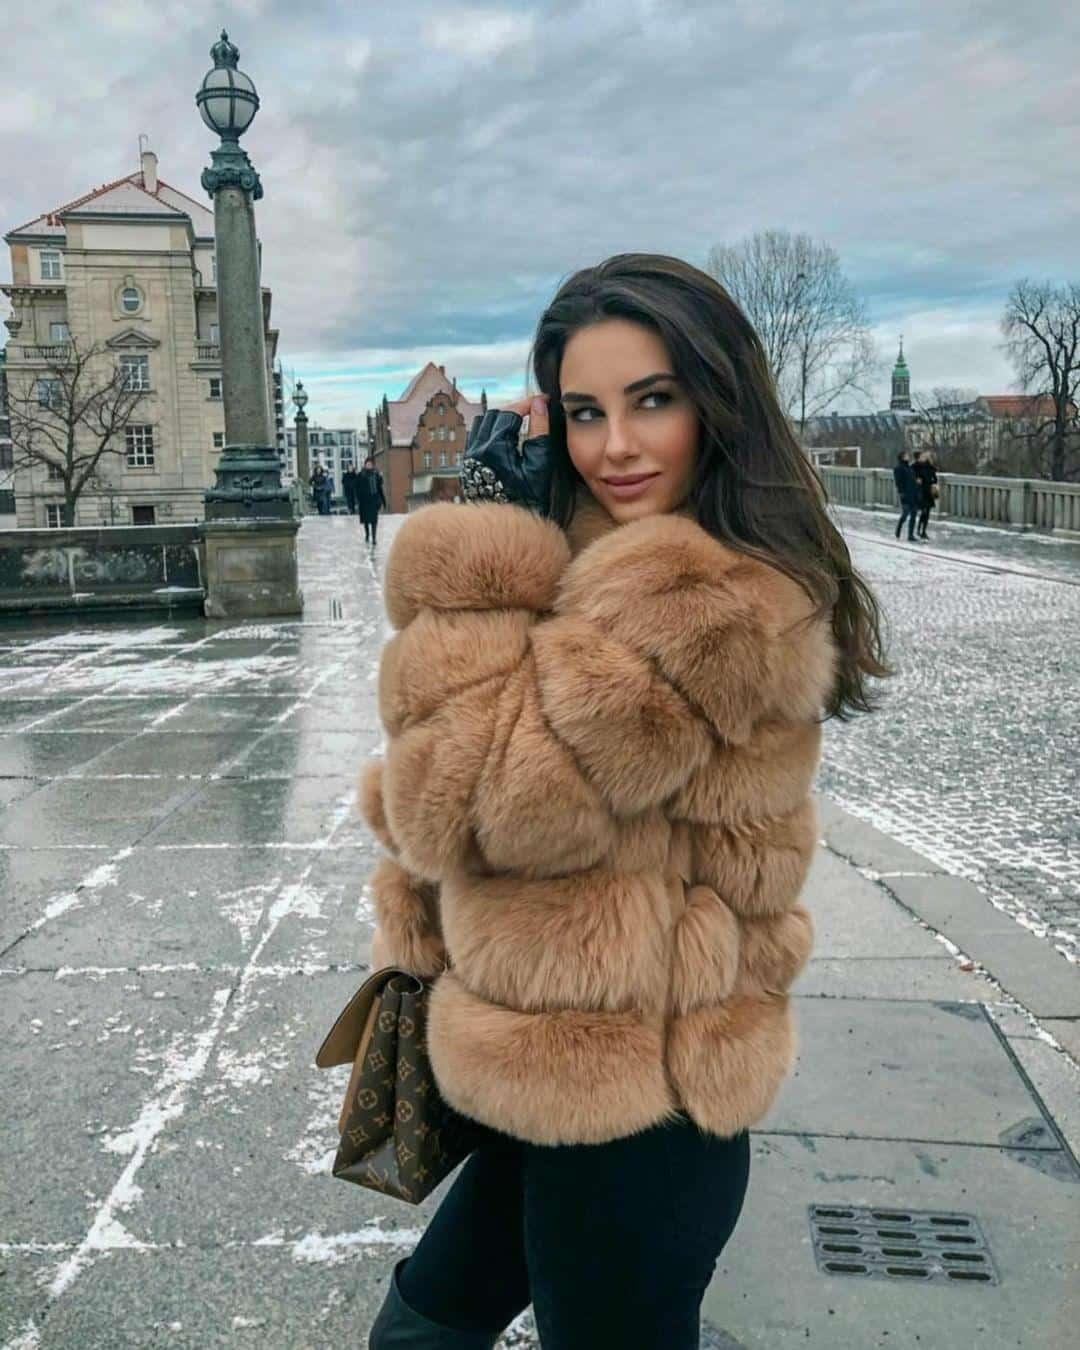 carla-camel-veronika_klimovits-1